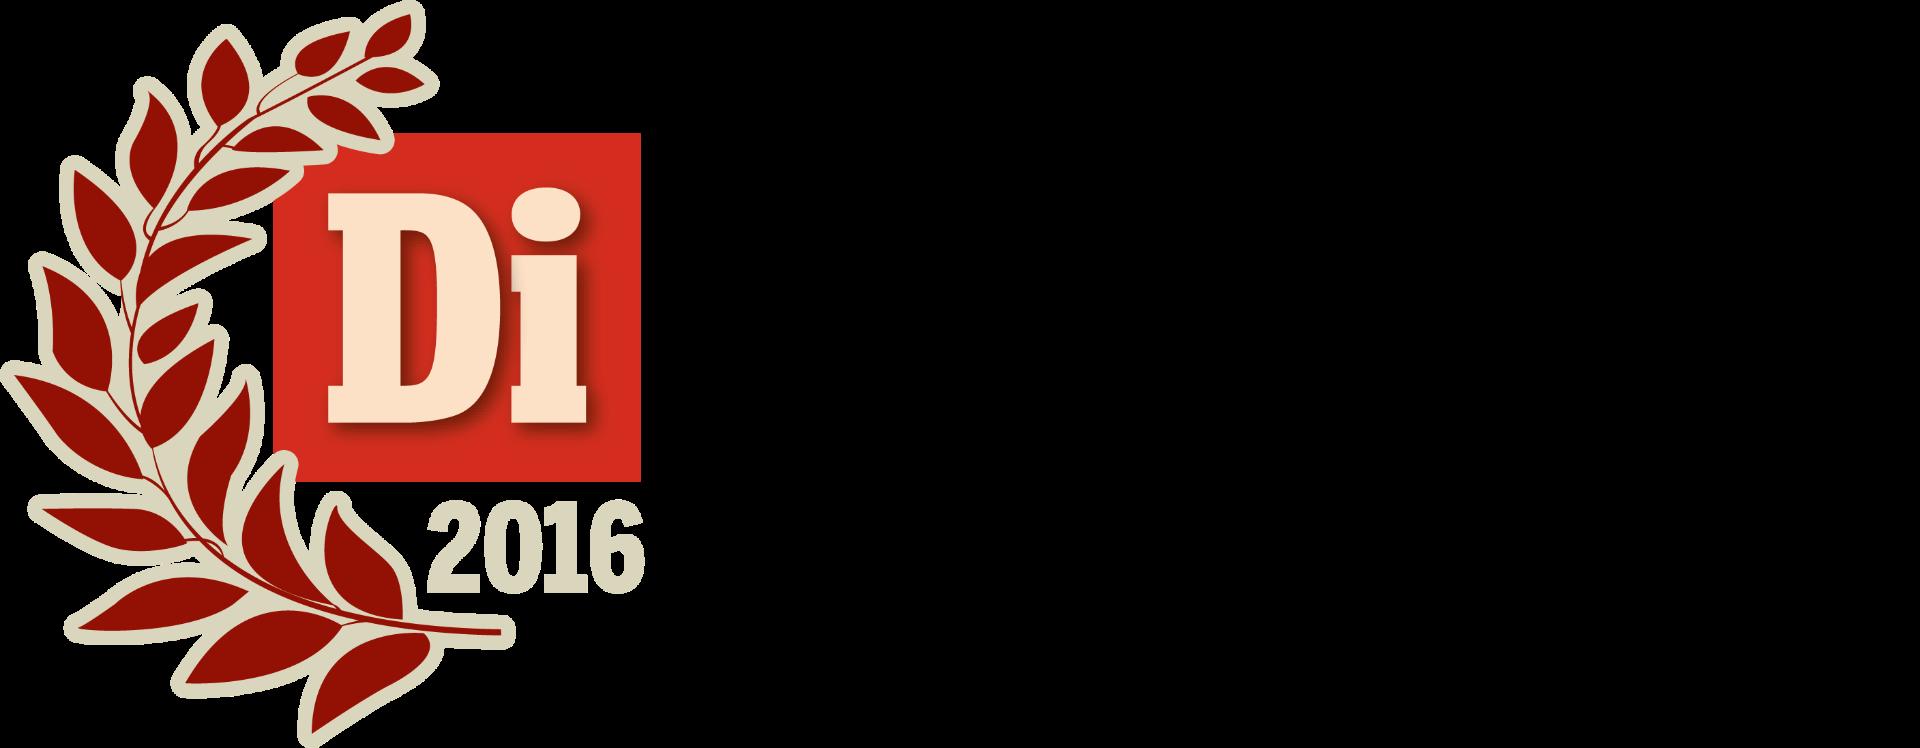 Gasellvinnare 2015, 2016 & 2018